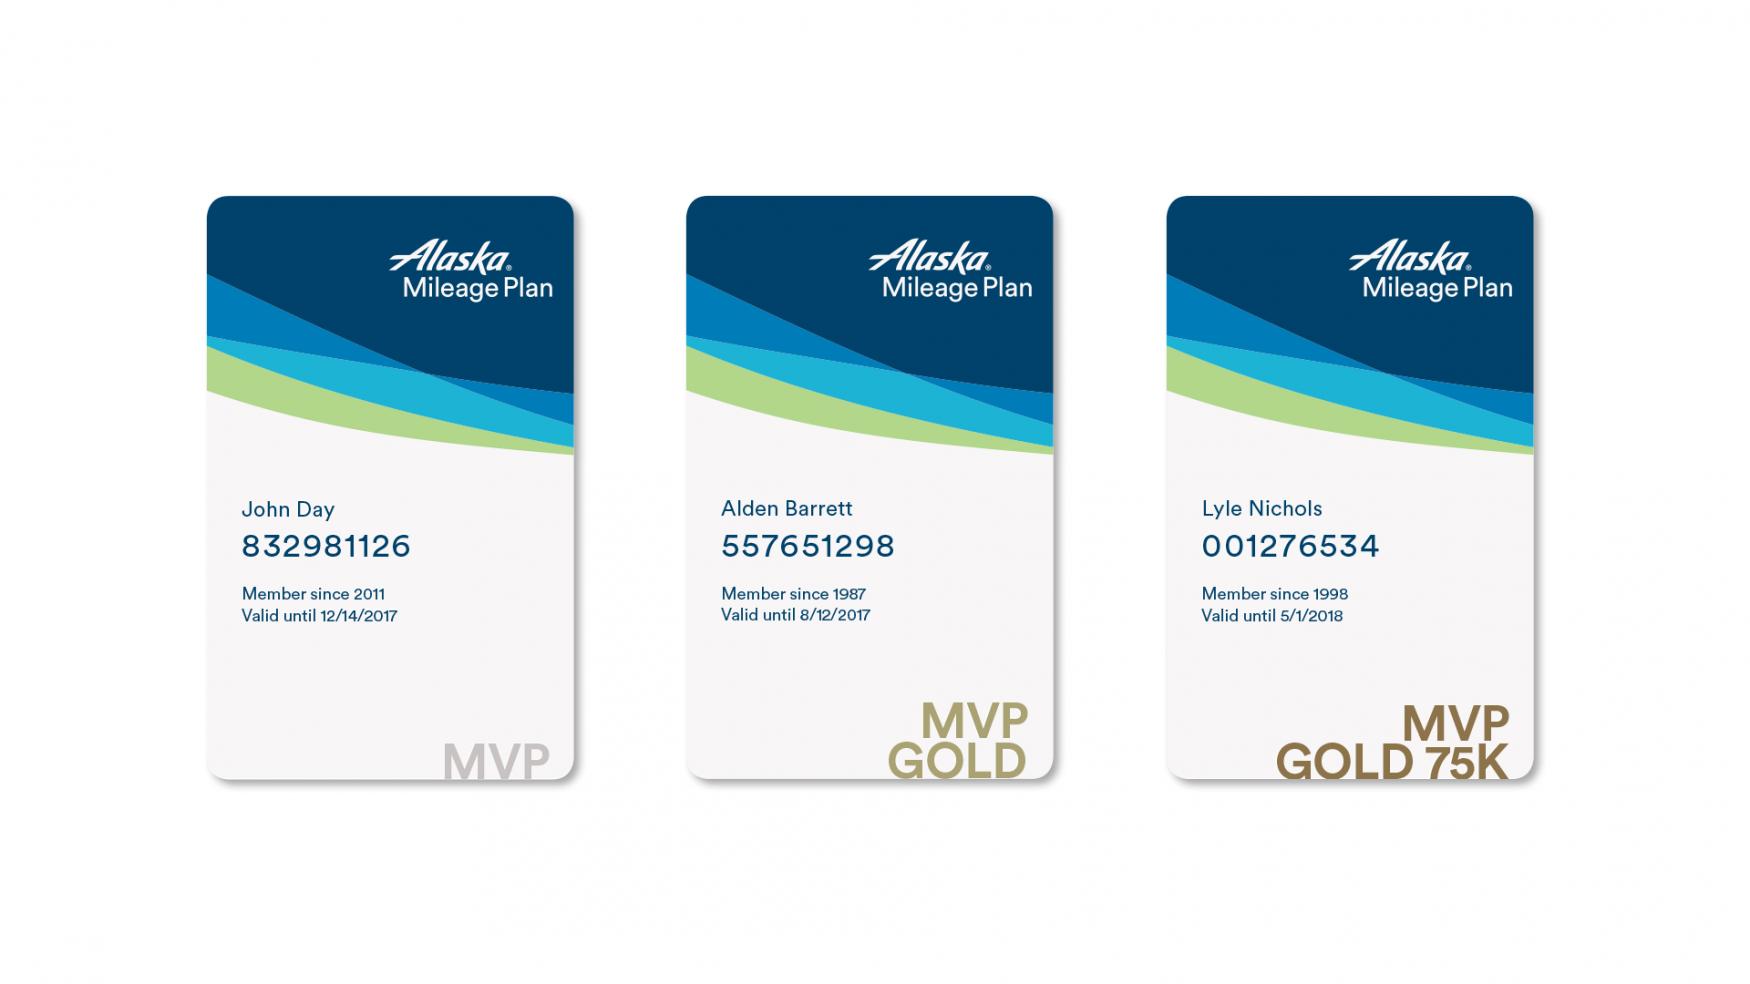 alaska-mp-elite-cards